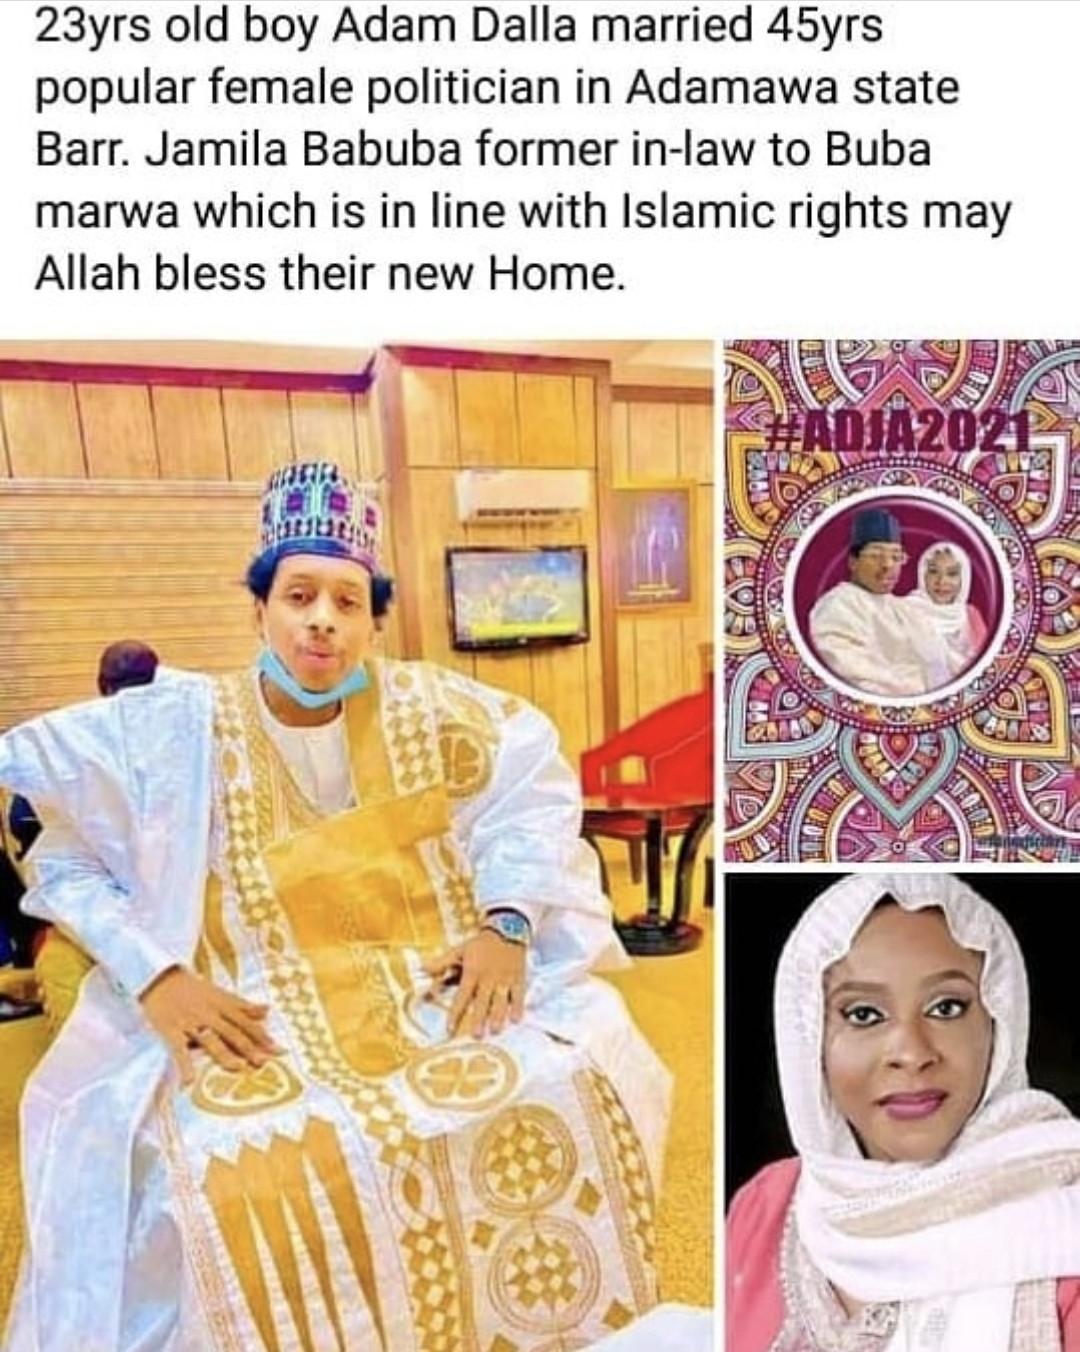 45-Year-Old Female Politician, Jamila Babuba Marries 23-Year-Old Man In Adamawa [Photos] 2